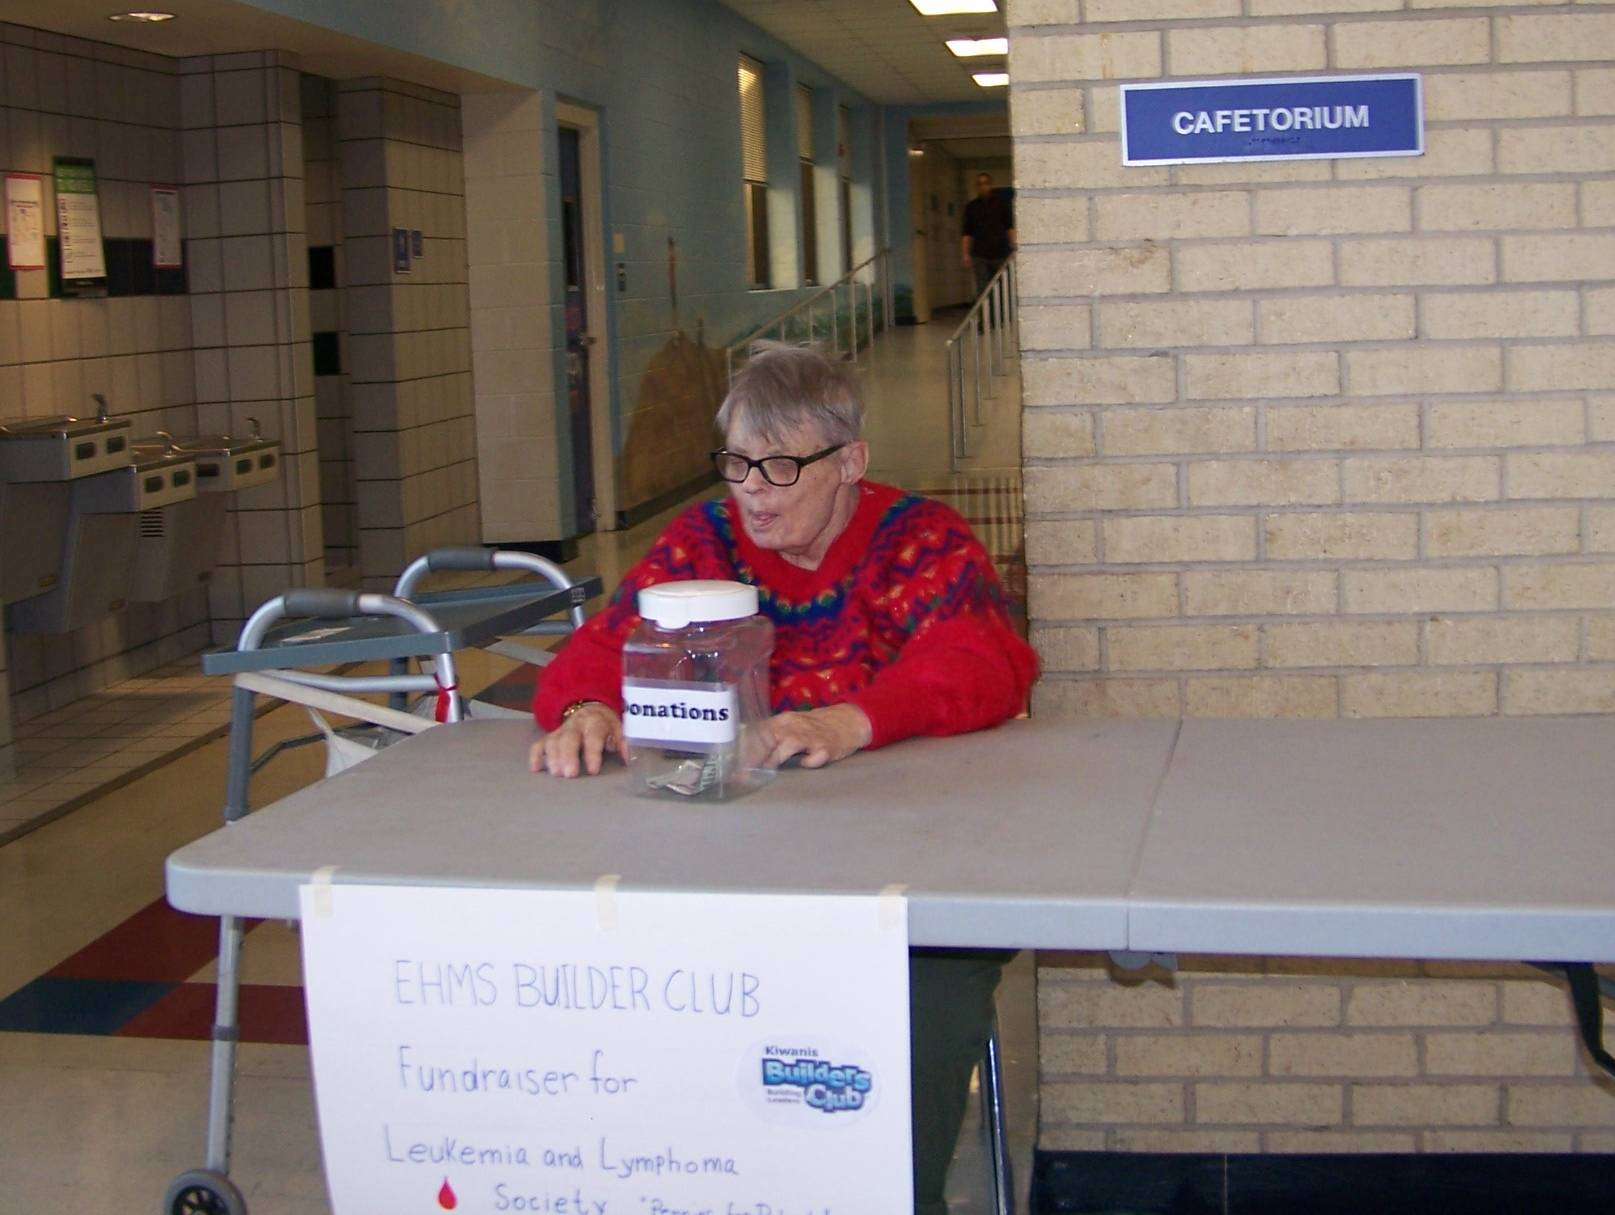 Builders Club Fundraiser for LLS